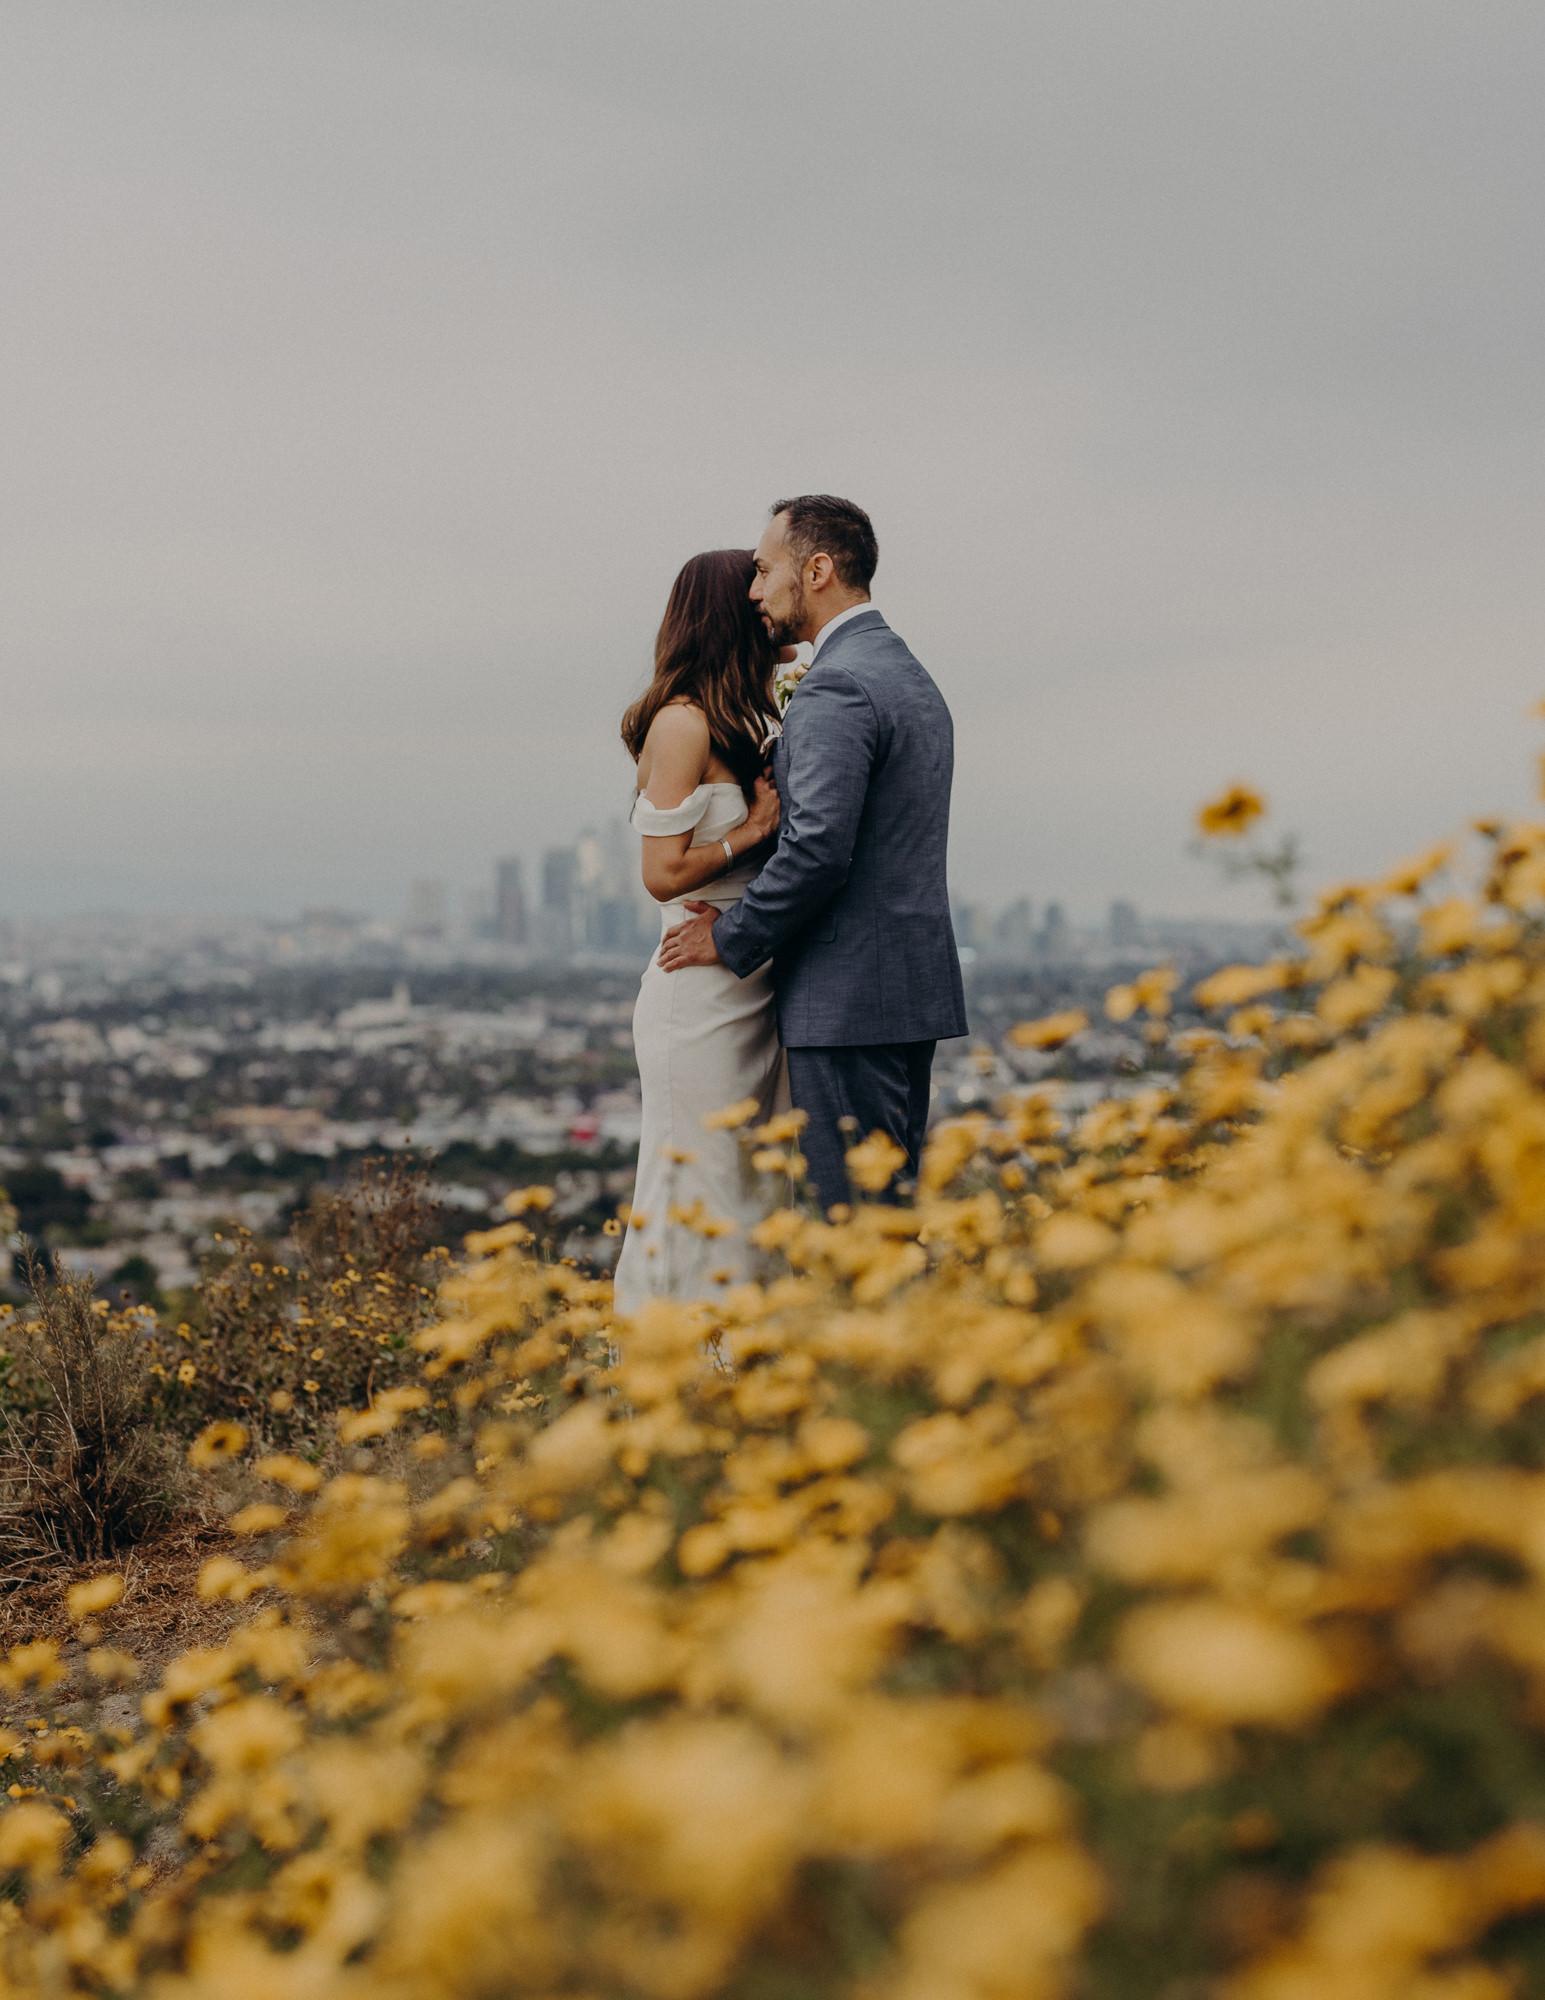 elopement photographer in los angeles - la wedding photographer - isaiahandtaylor.com-050.jpg